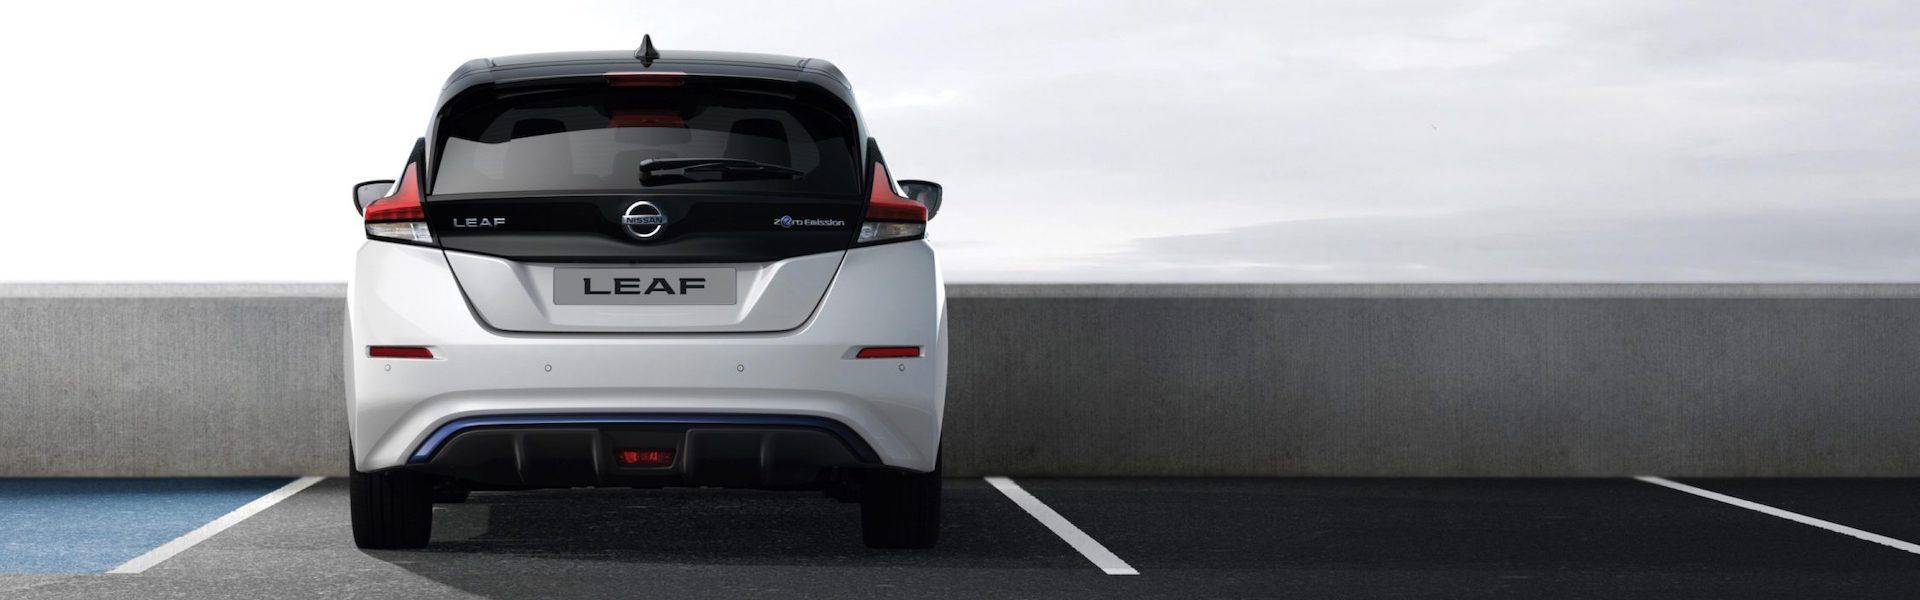 traseira do Nissan Leaf